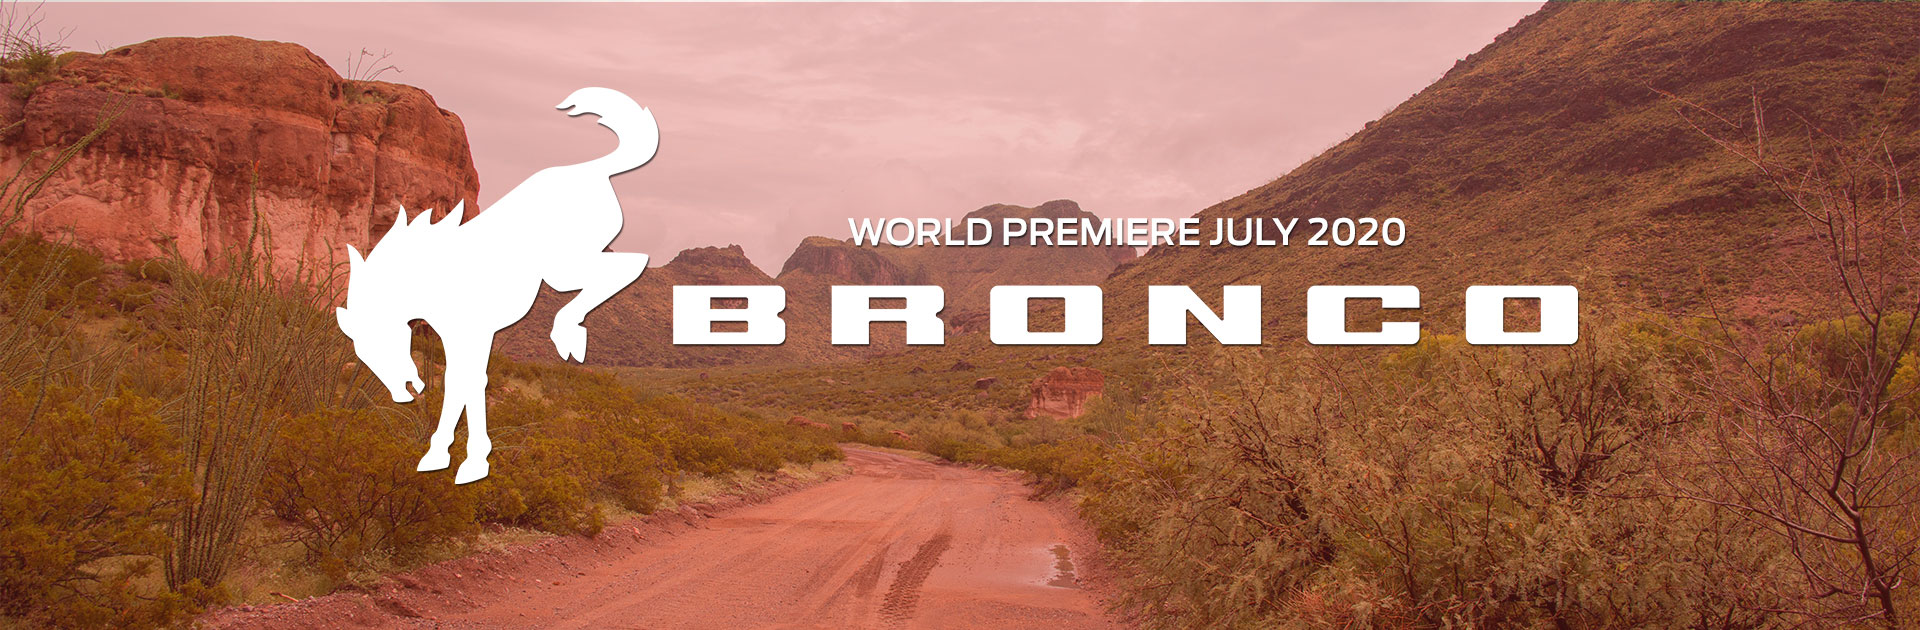 Bronco Coming Soon Texas Edition